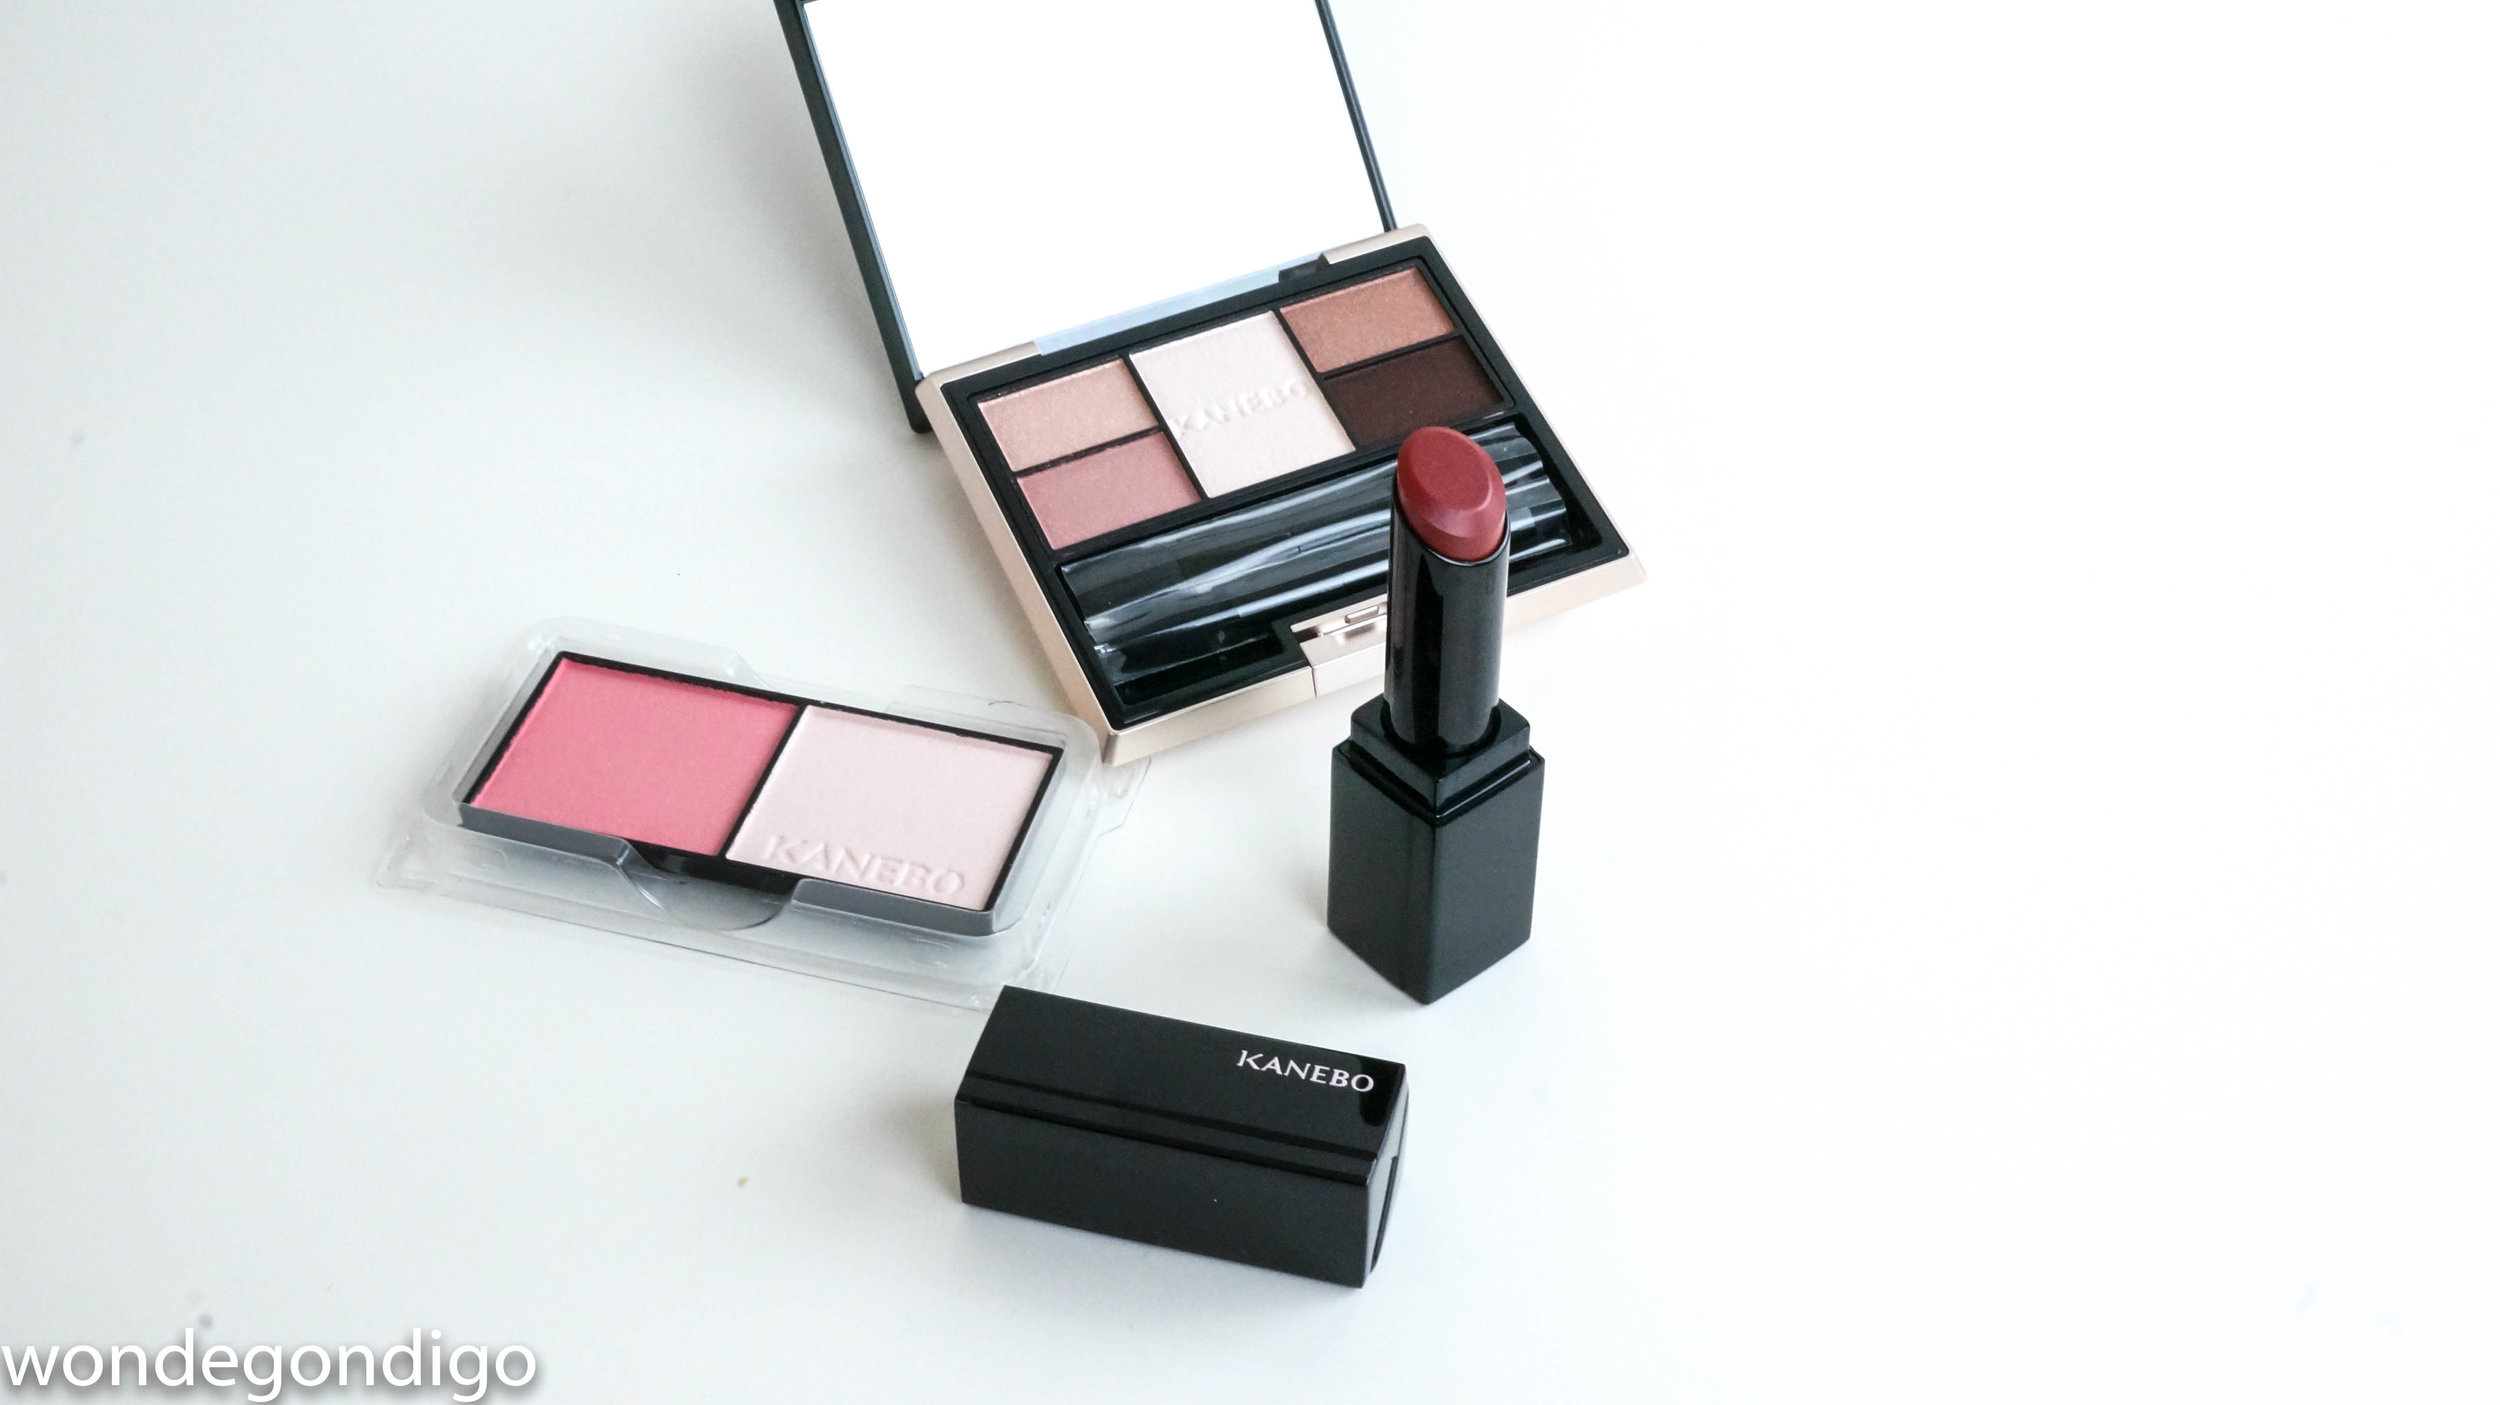 Kanebo! Variant Brosse (Cheeks) in 02 Pink Petal, Selection Colors Eyeshadow in 03 Gently Pink, and Moisture Rouge 06 Deep Red